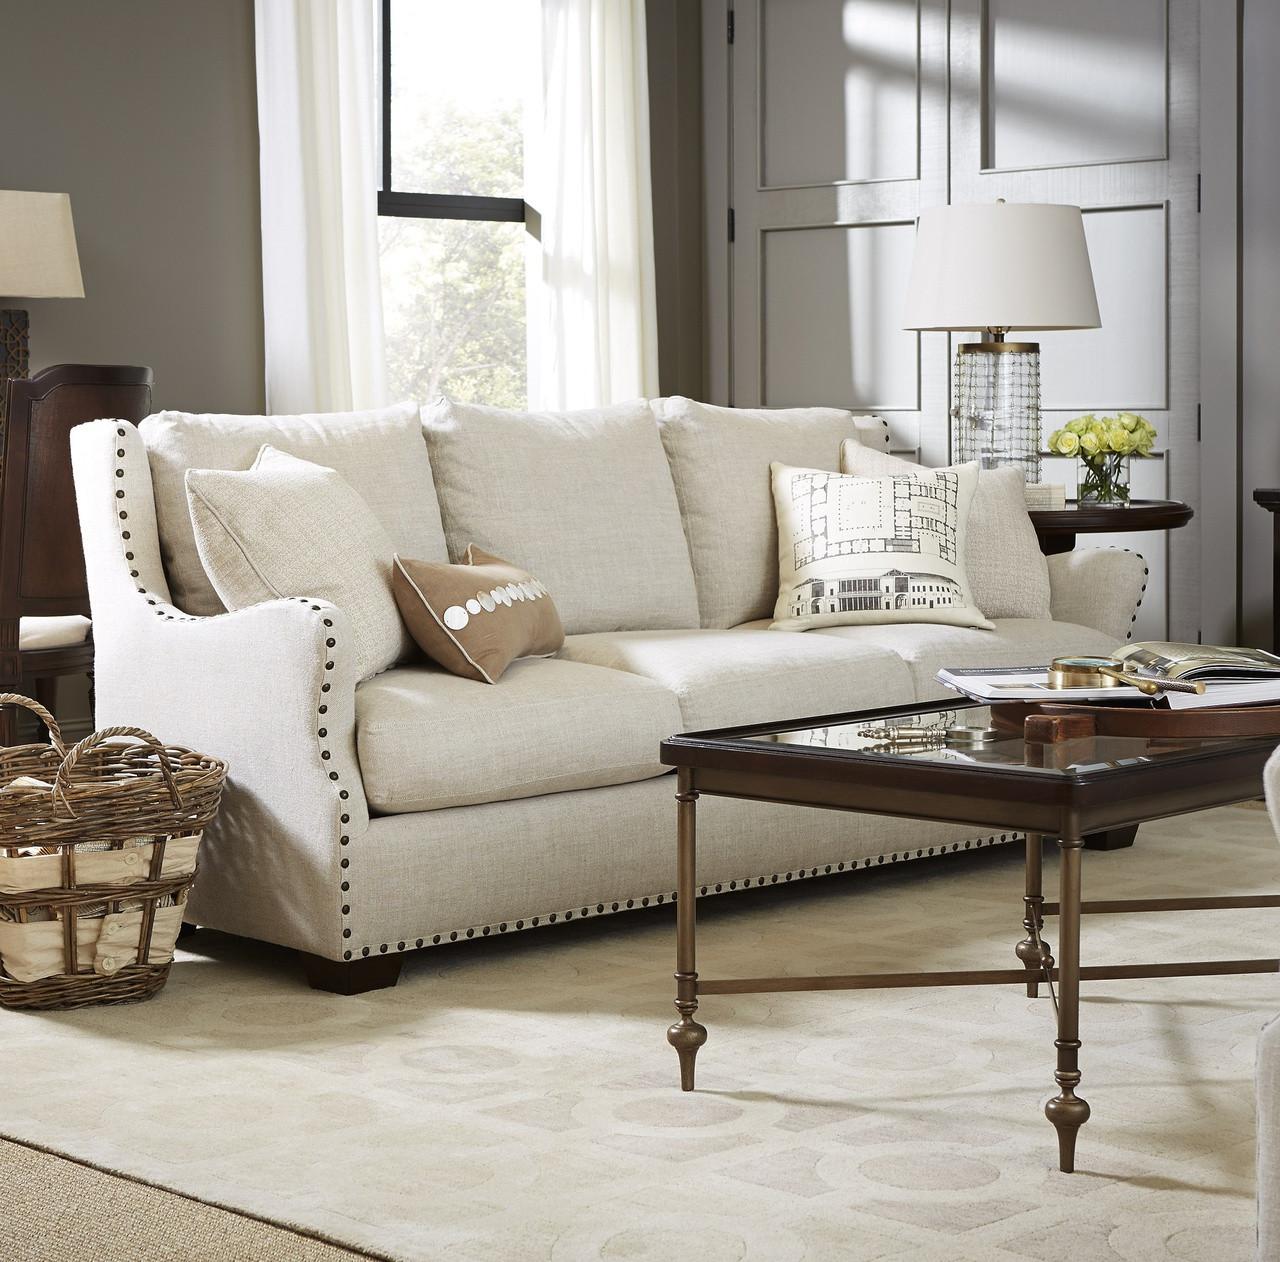 belgian linen sofa ashford next home connor upholstered slope arm zin